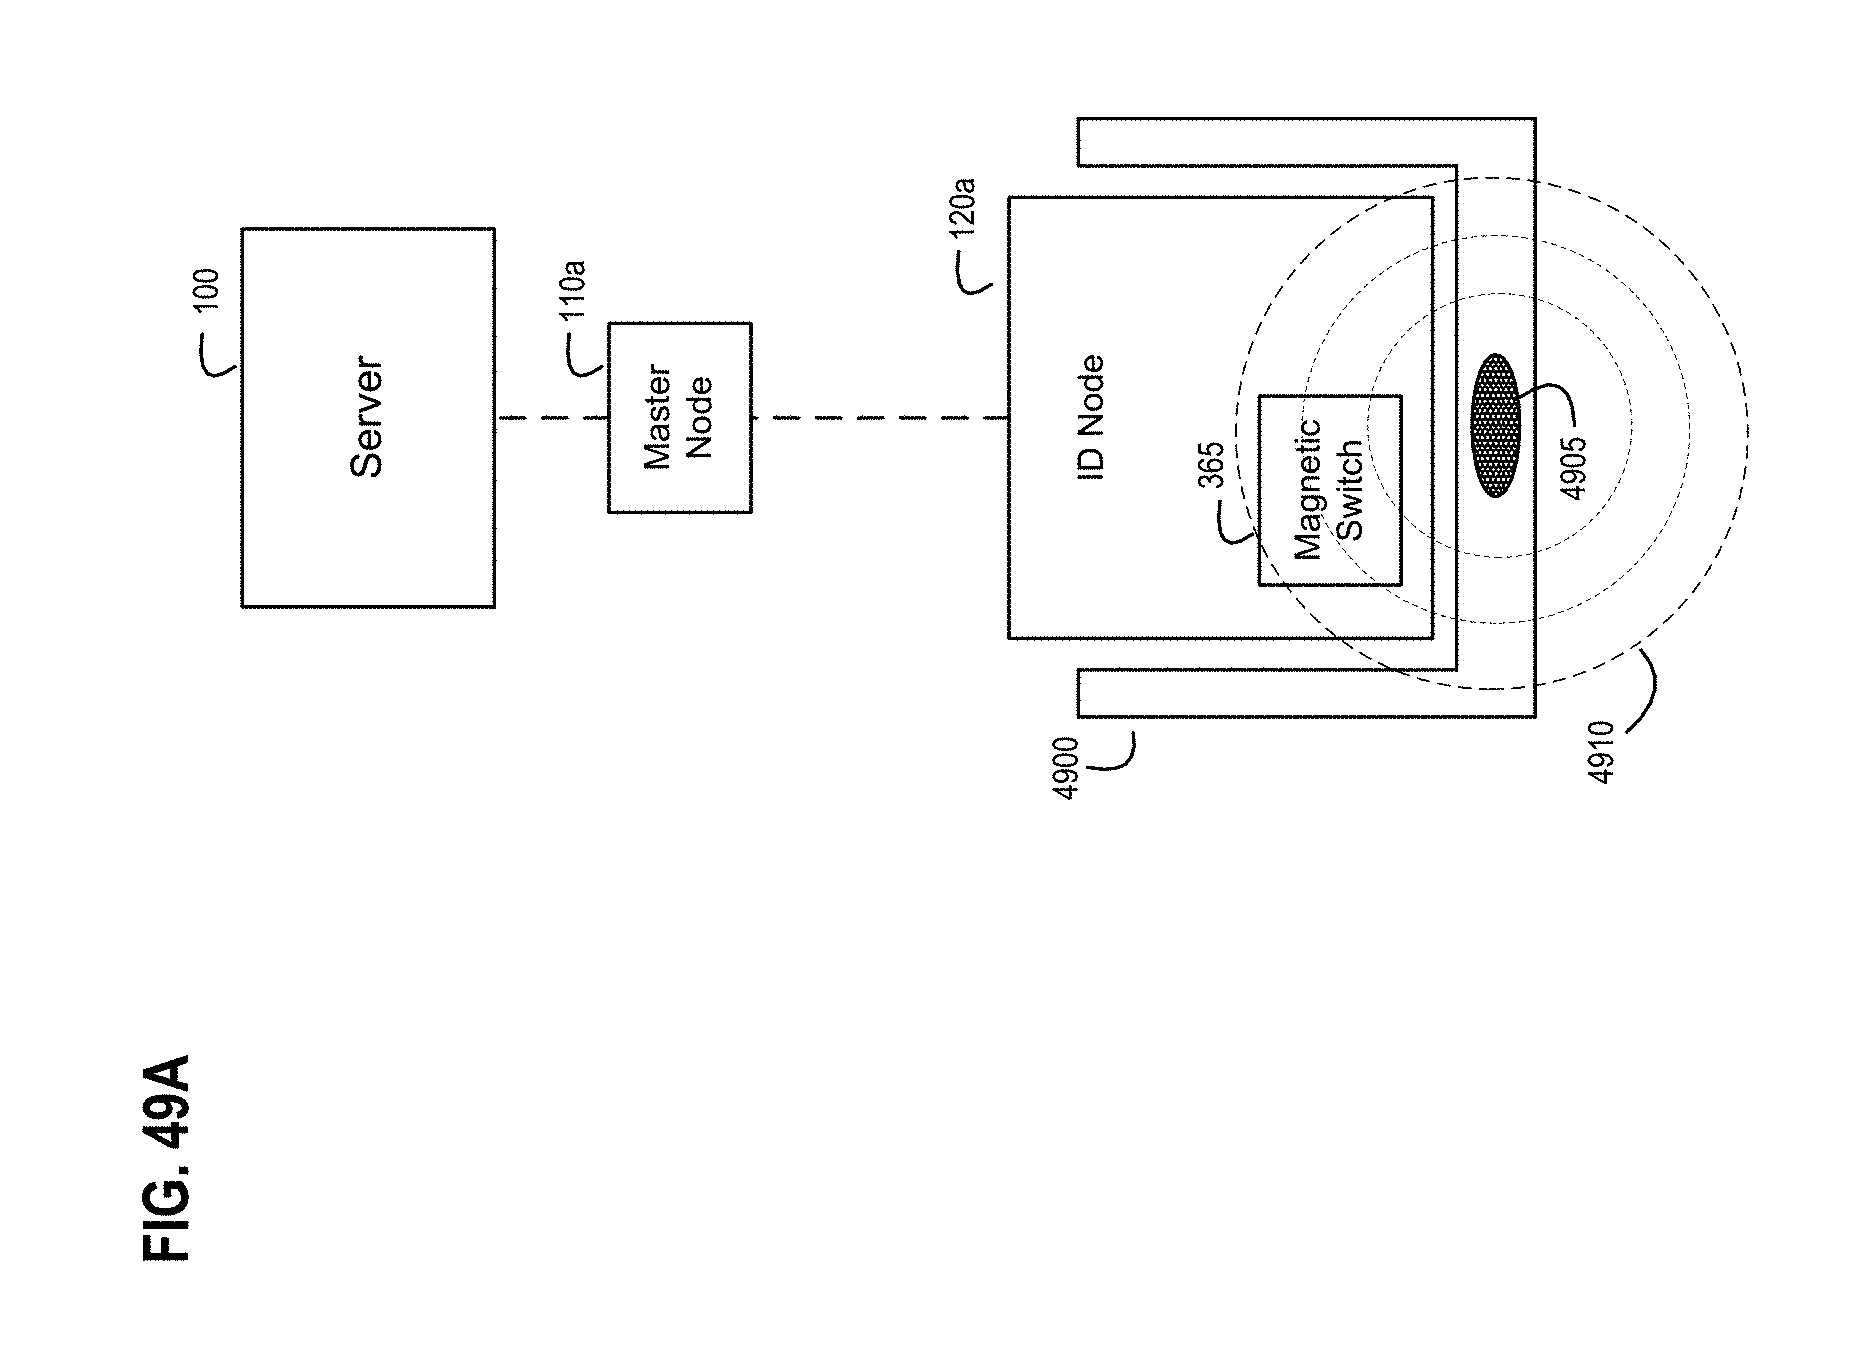 Patent Us 9913240 B2 Galaxy Caravan Wiring Diagram Images